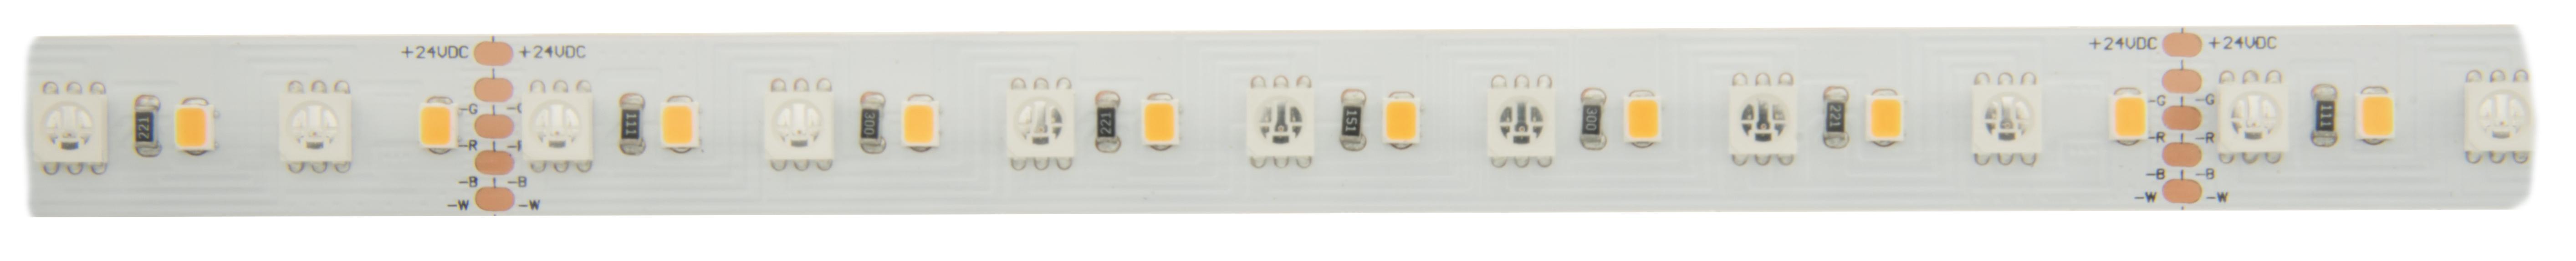 1 Stk Flexstrip 115 RGB CLW 90+ 14,7W/m 971lm/m, 24VDC IP44, l=5m LIFS009500